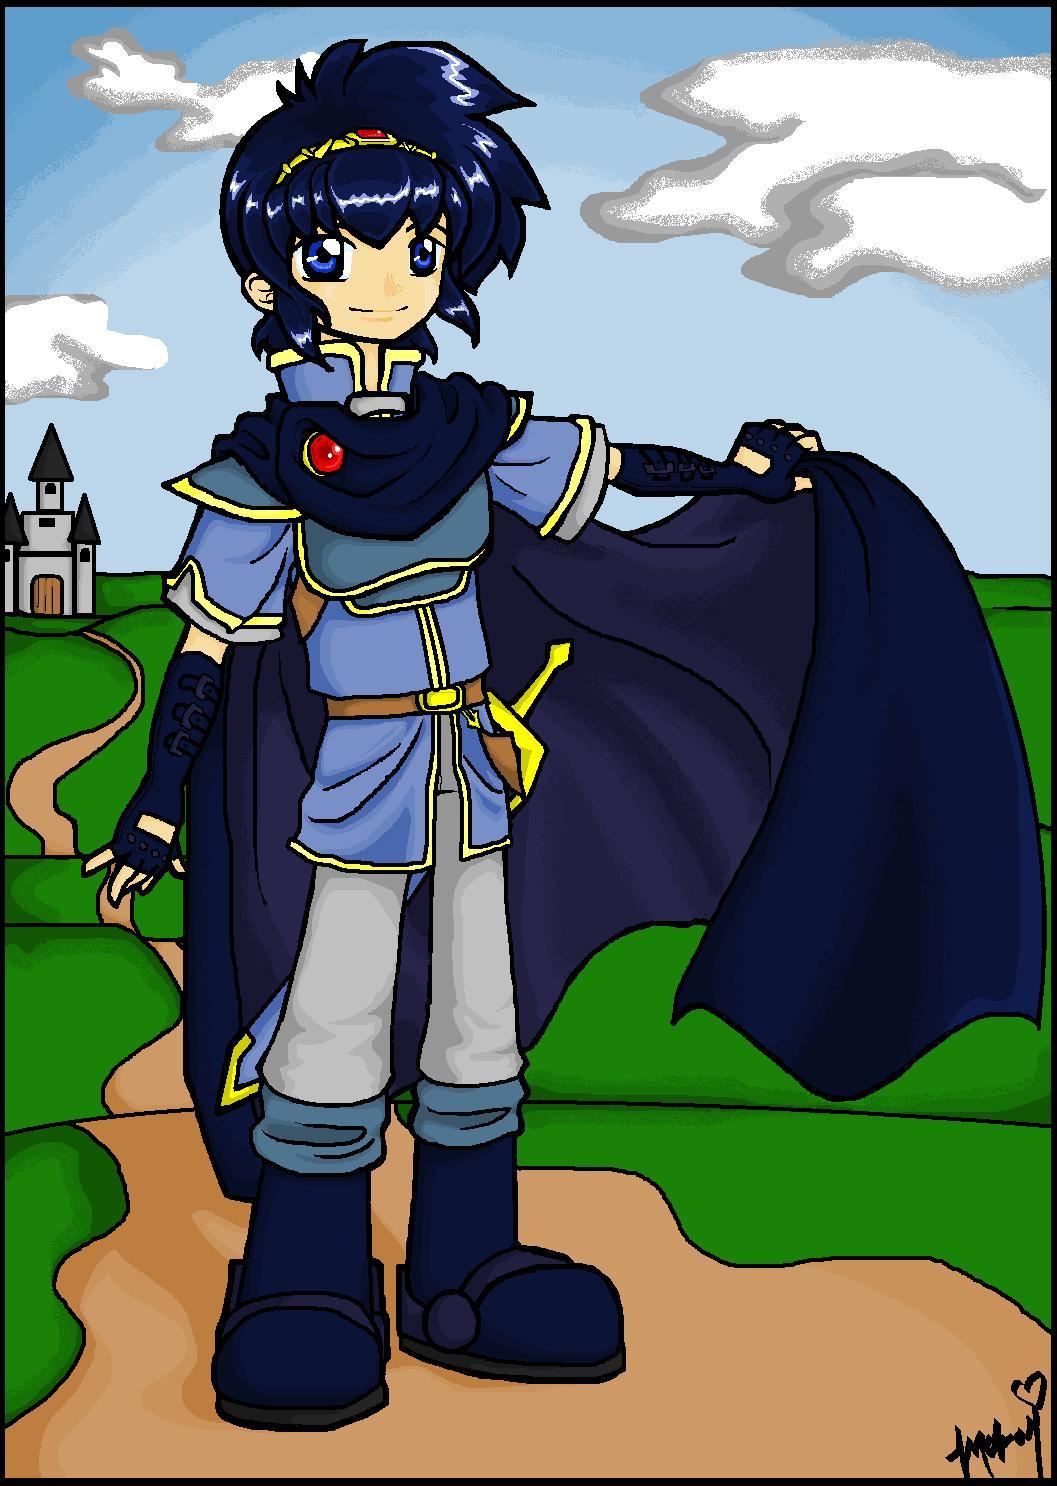 Prince Marth (MSpaint) by Anime_Yokai_Mckai